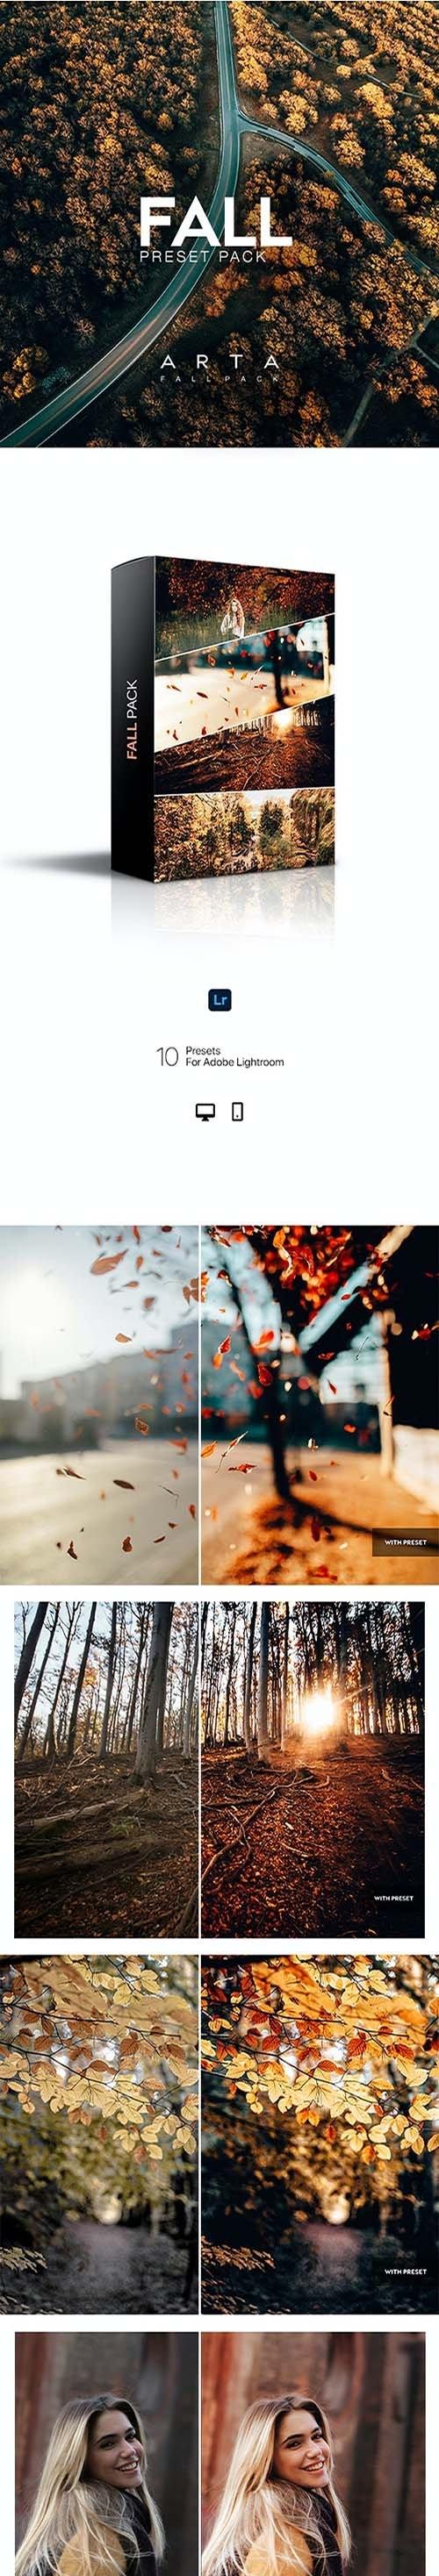 ARTA Fall Pack For Mobile and Desktop Lightroom 28906487